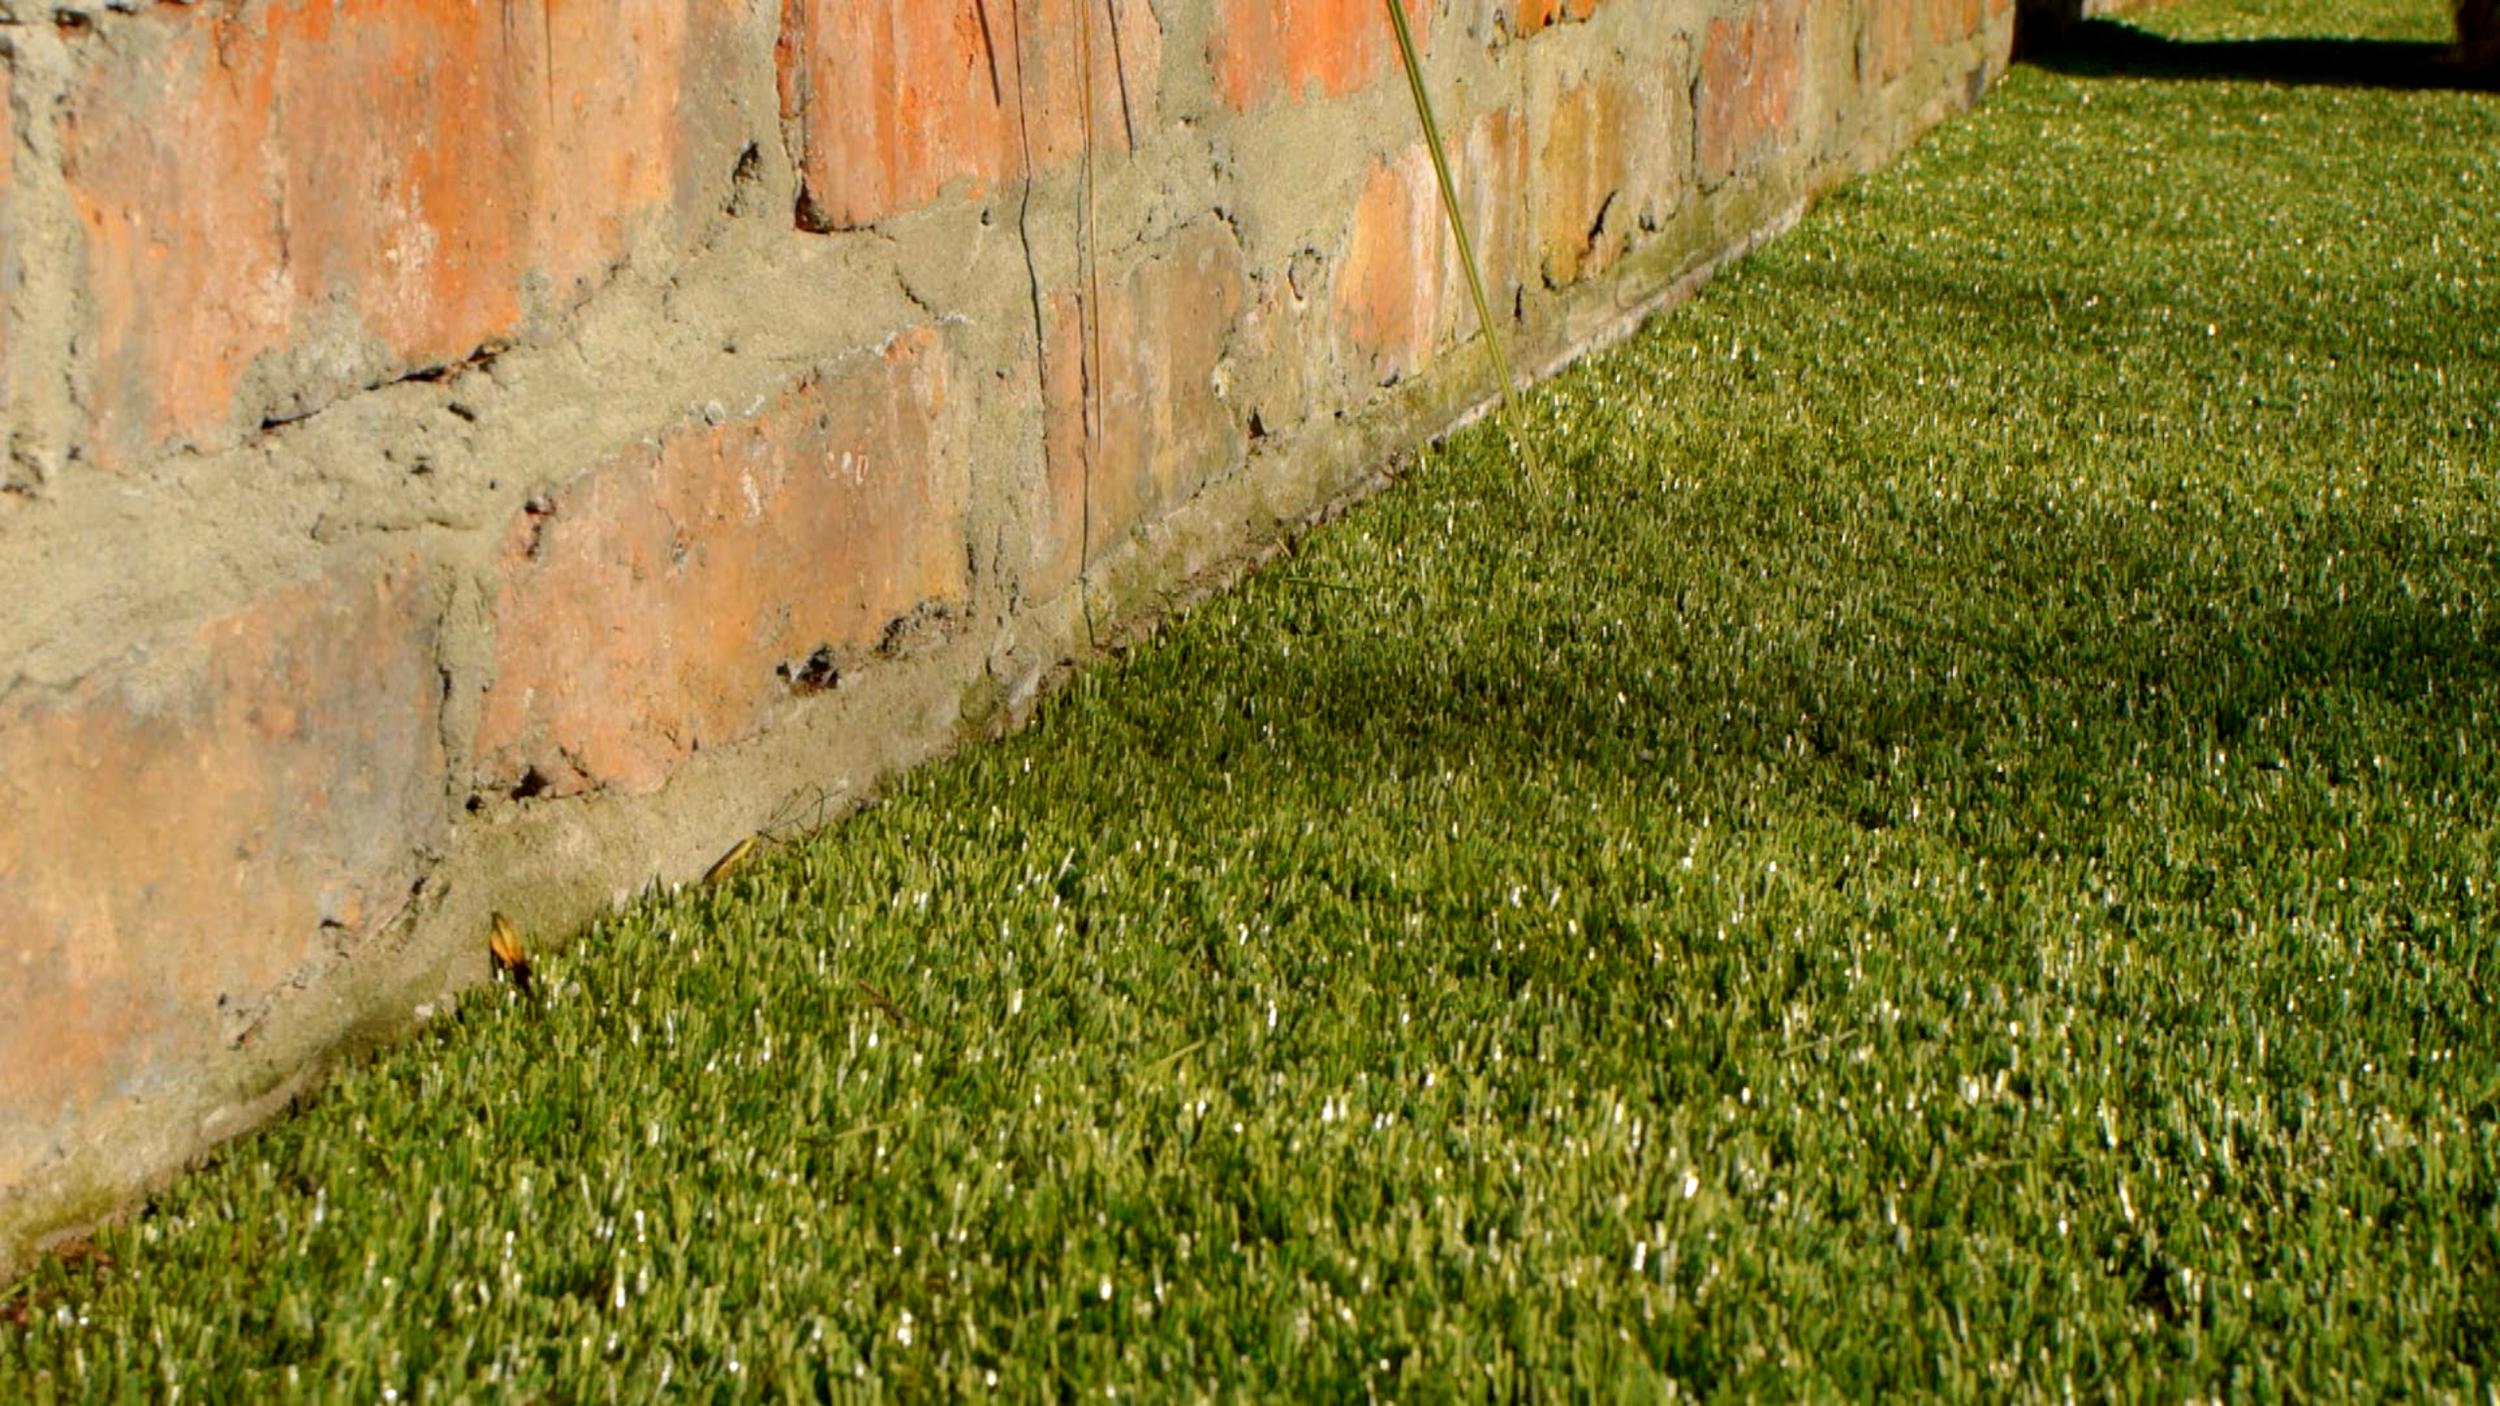 red brick wall and turf